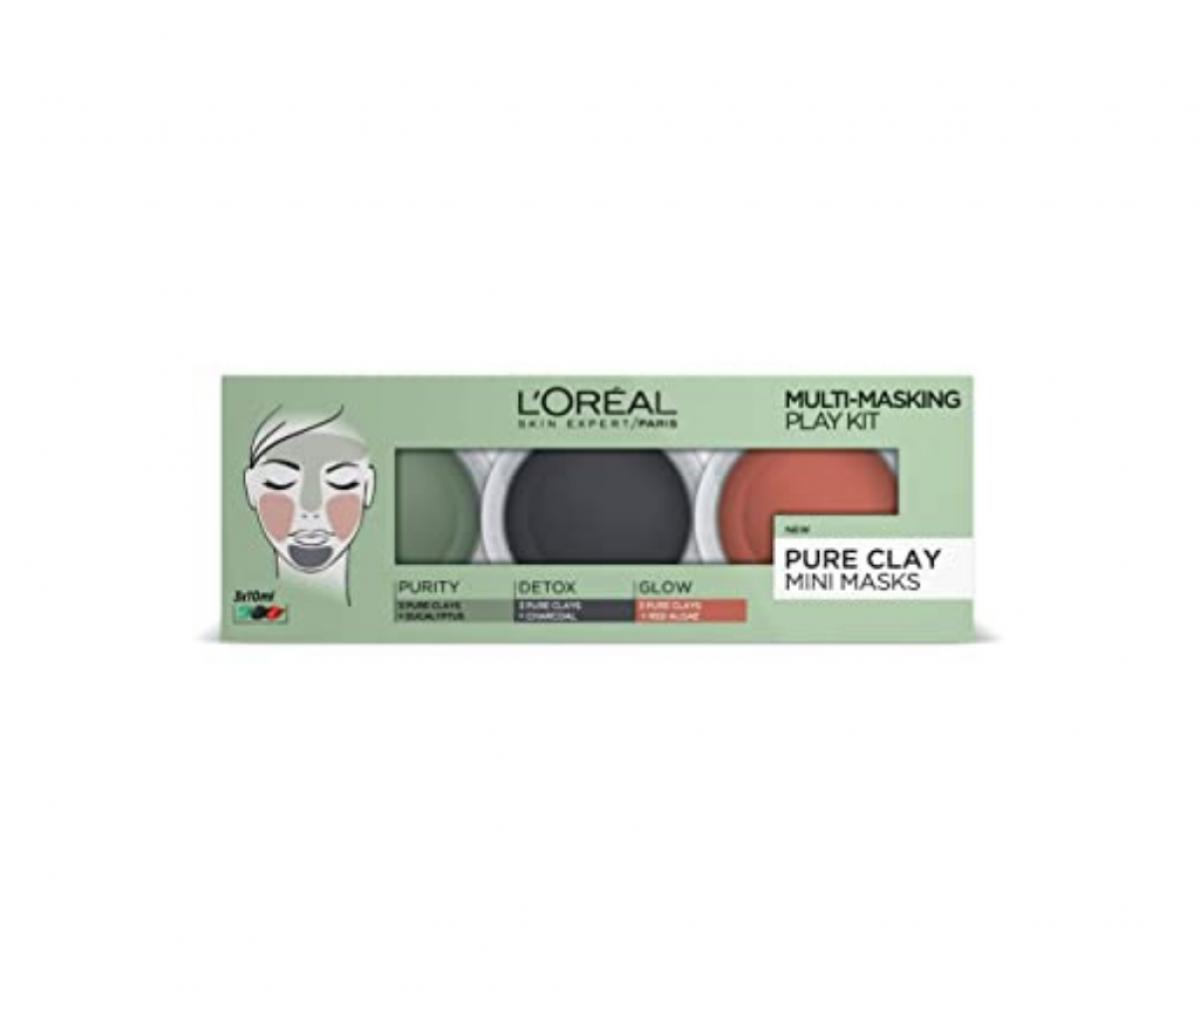 Loreal Multi Face Mask - Mini Set 10ml